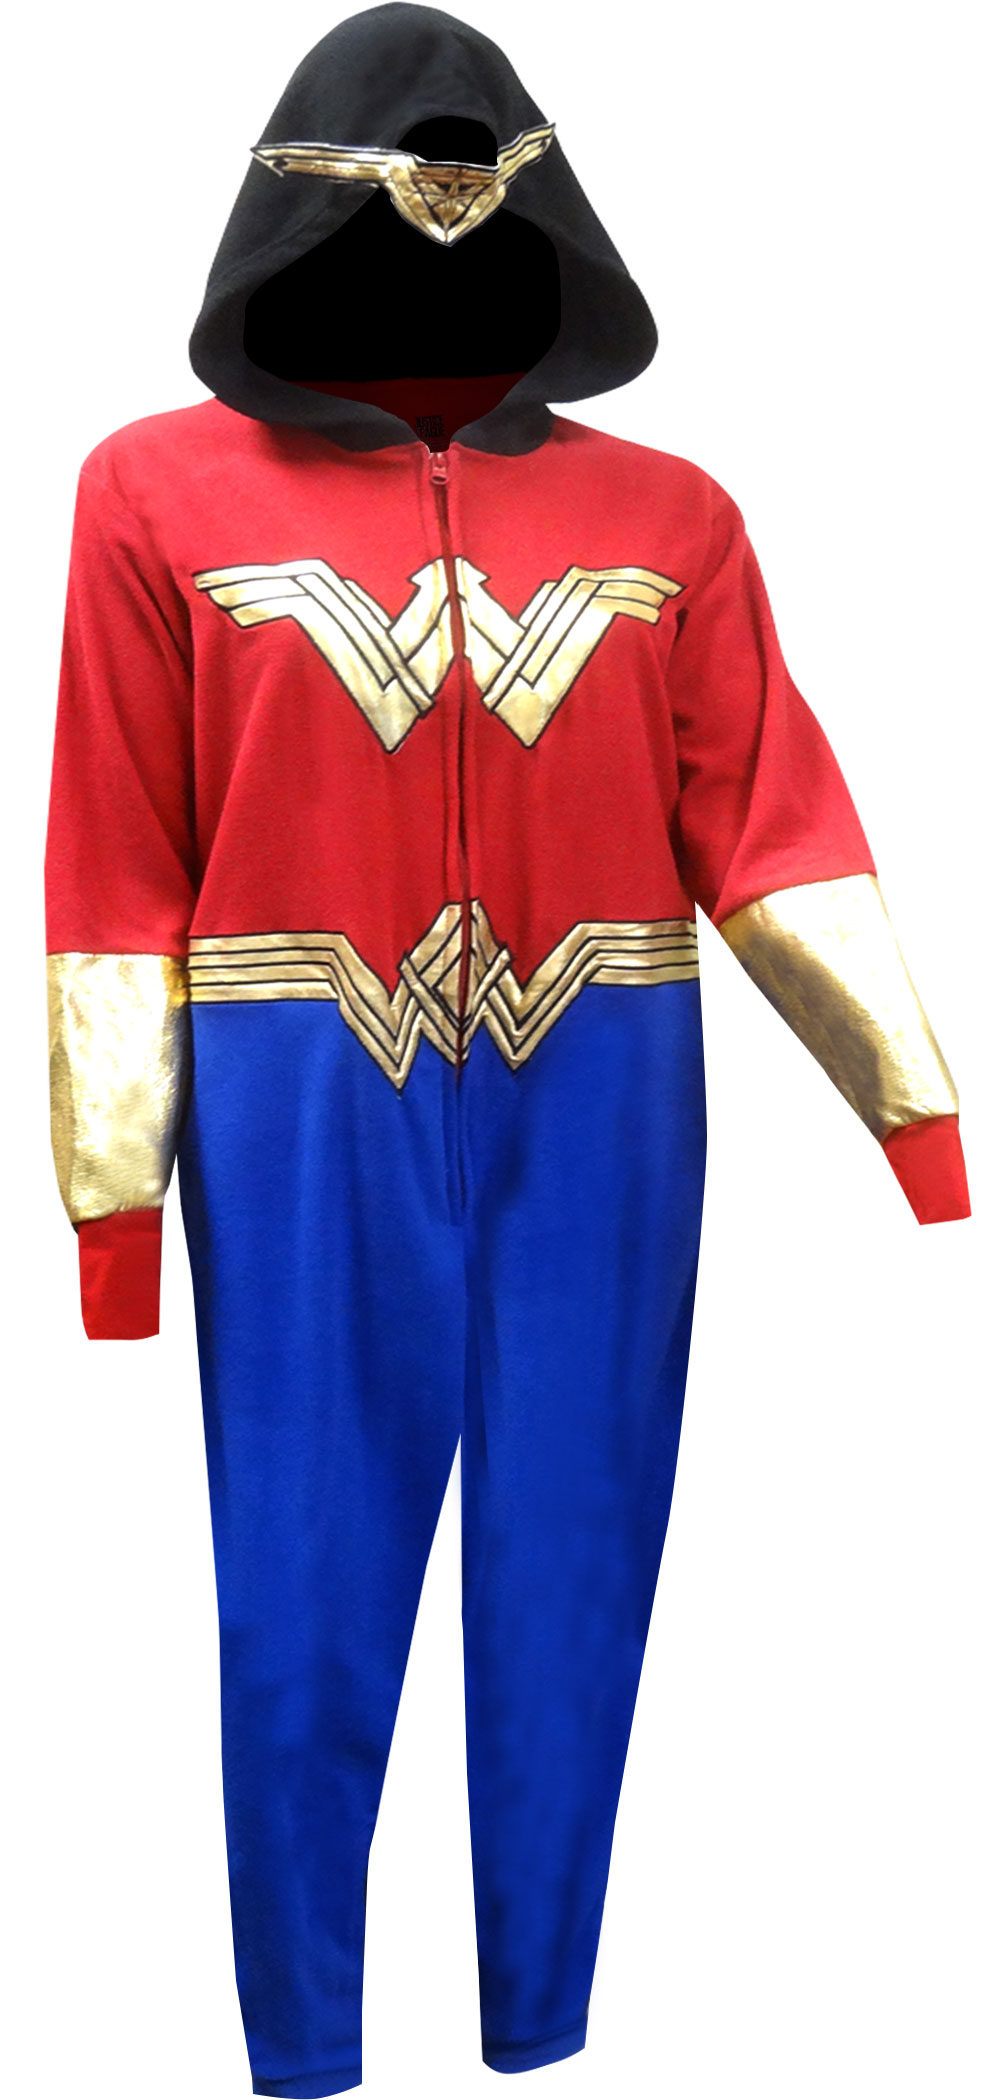 Underboss Wonder Woman Golden Accent Onesie Pajama With